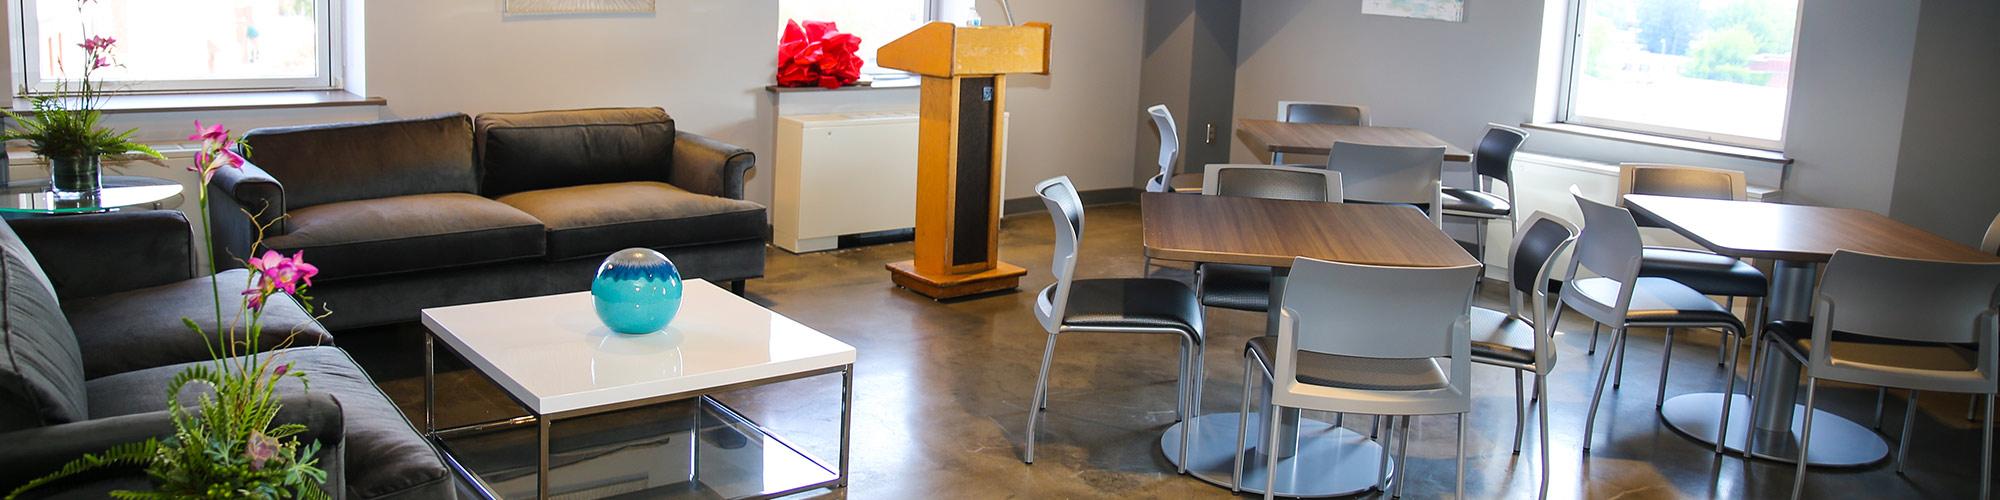 healthier-living-work-spaces